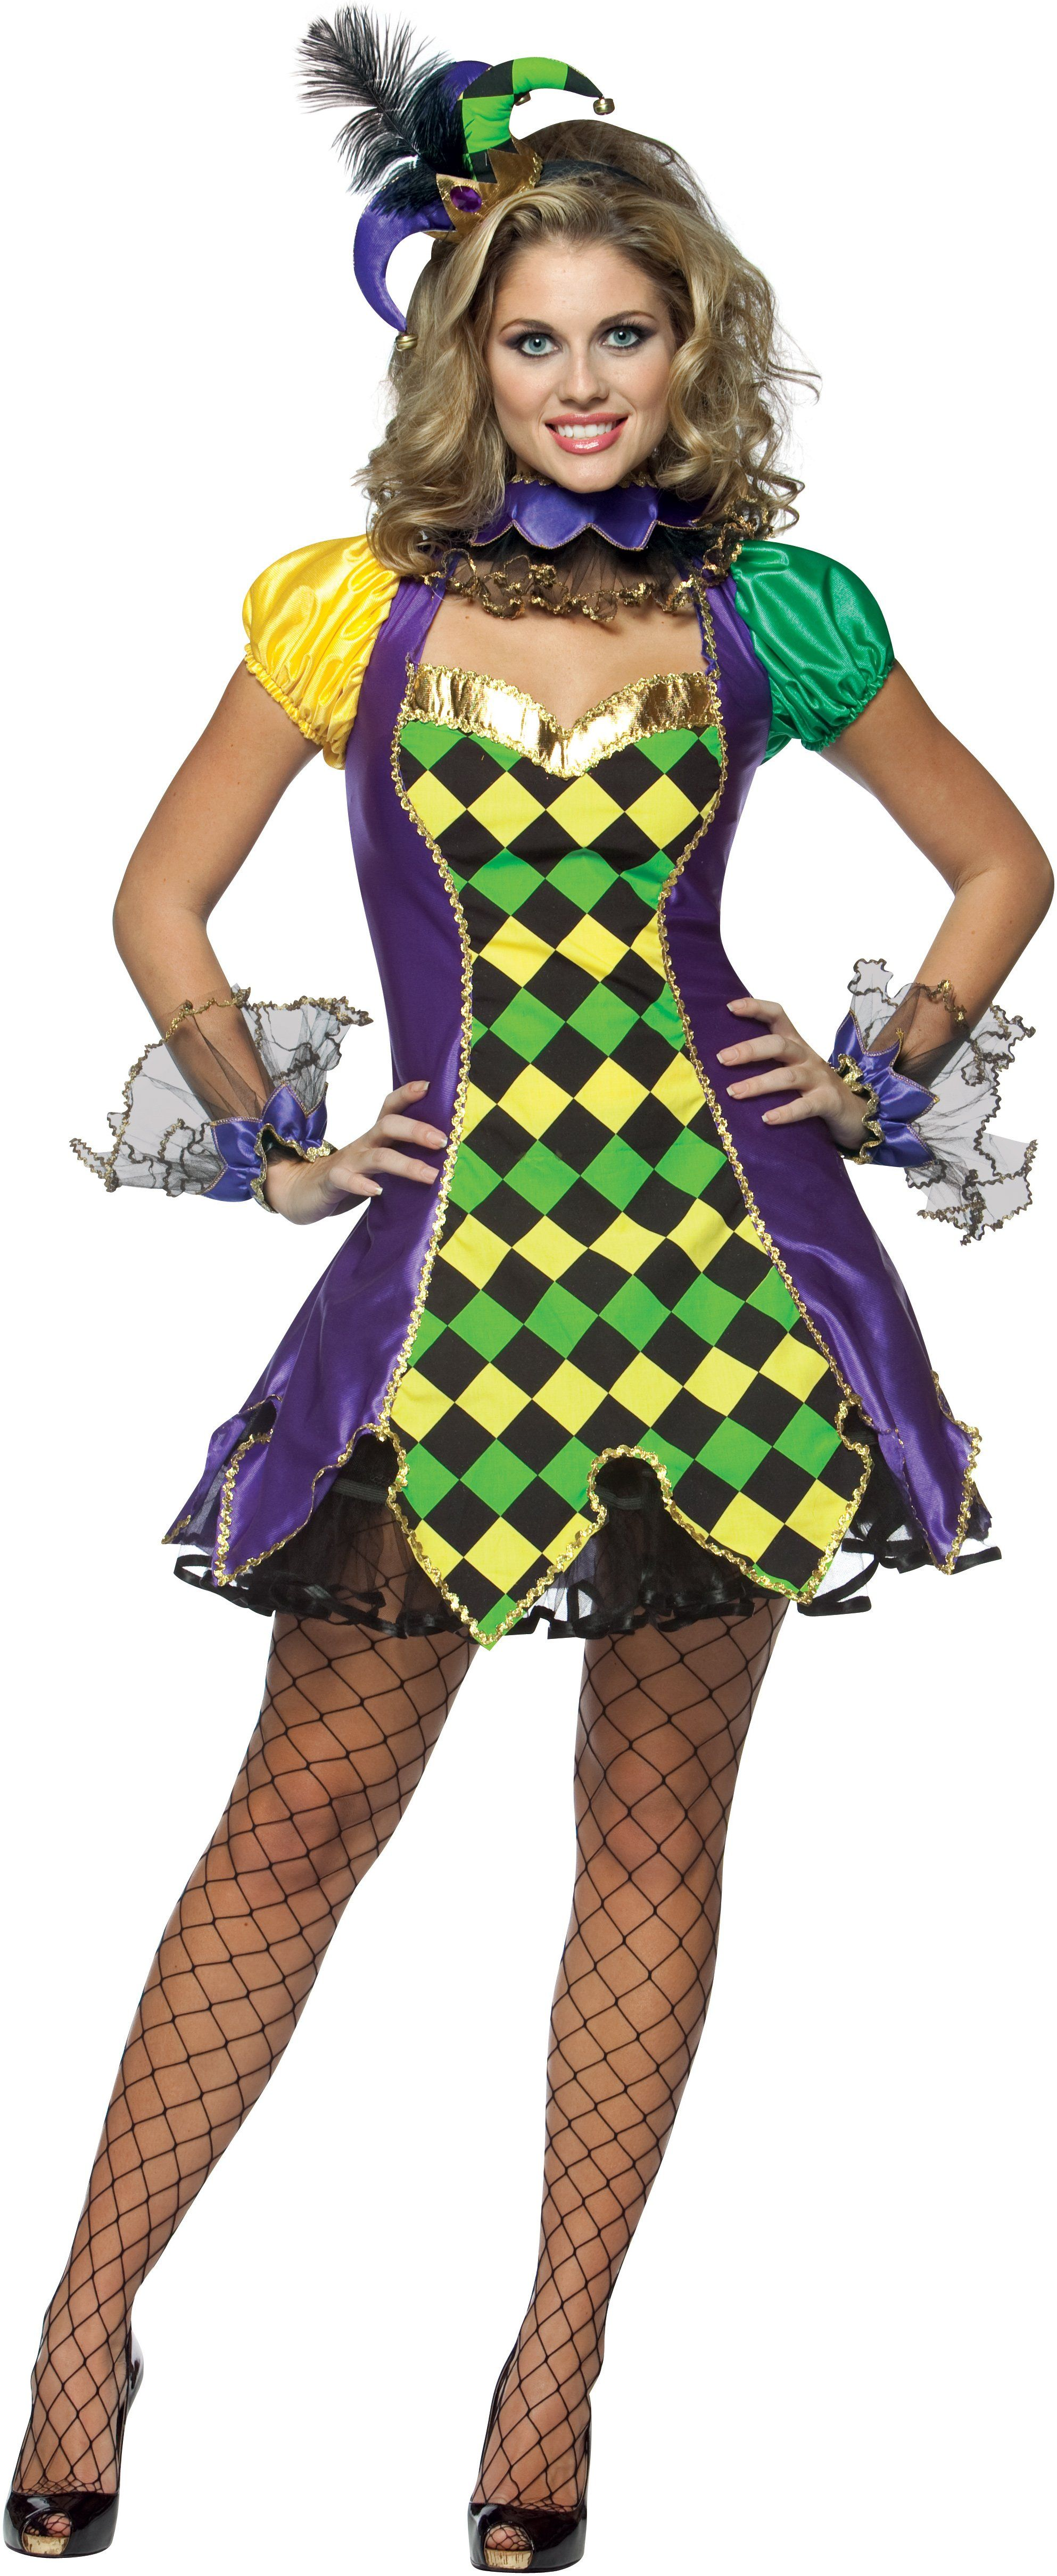 7b0d96f5554af Nice Costumes Mardi Gras Jester Woman Costume just added...   mardi ...